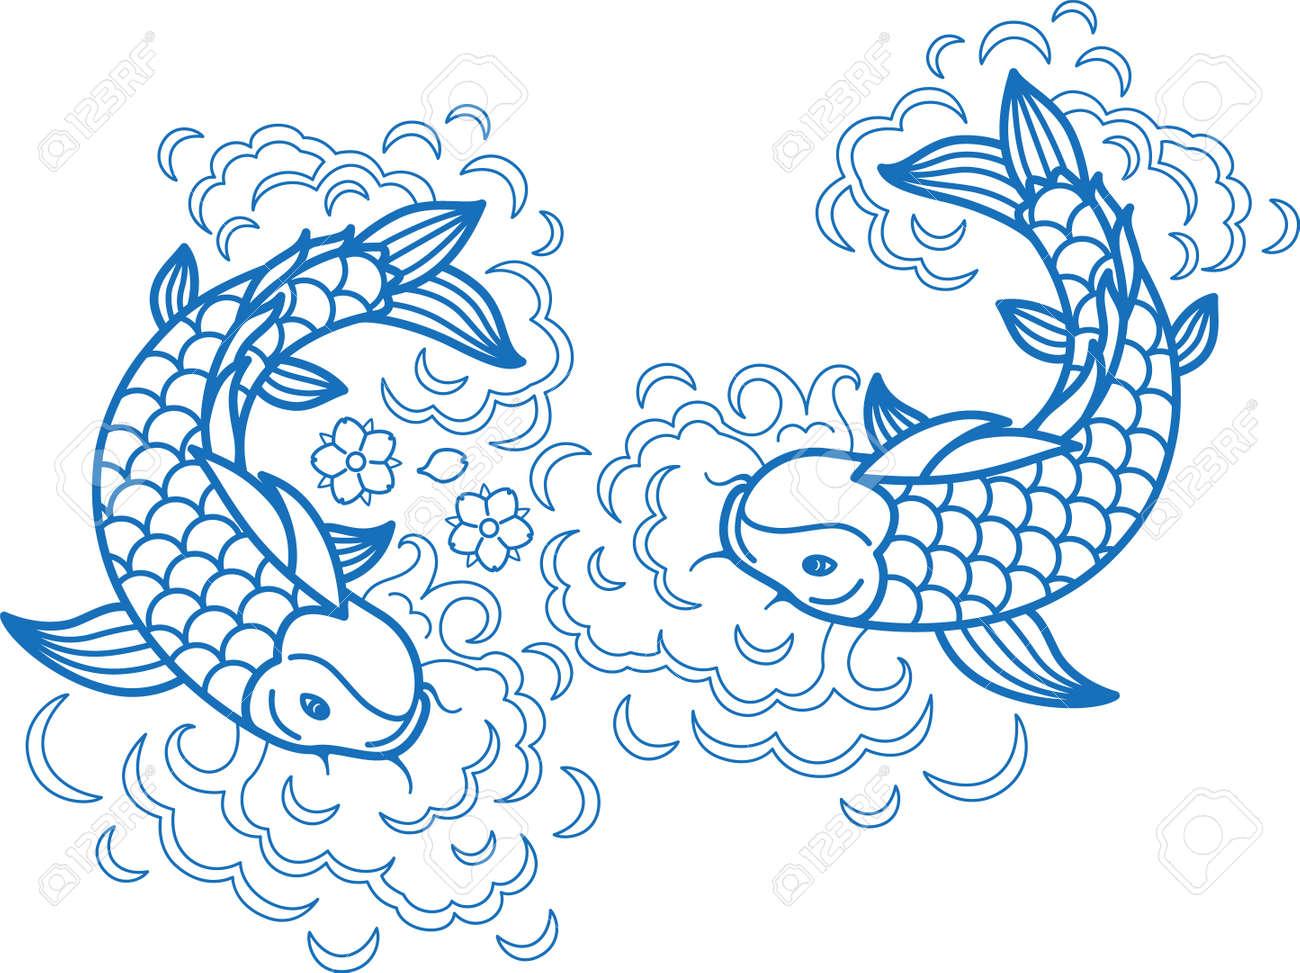 Fish koi art carp line traditional drawing japan goldfish ink element - 171052324